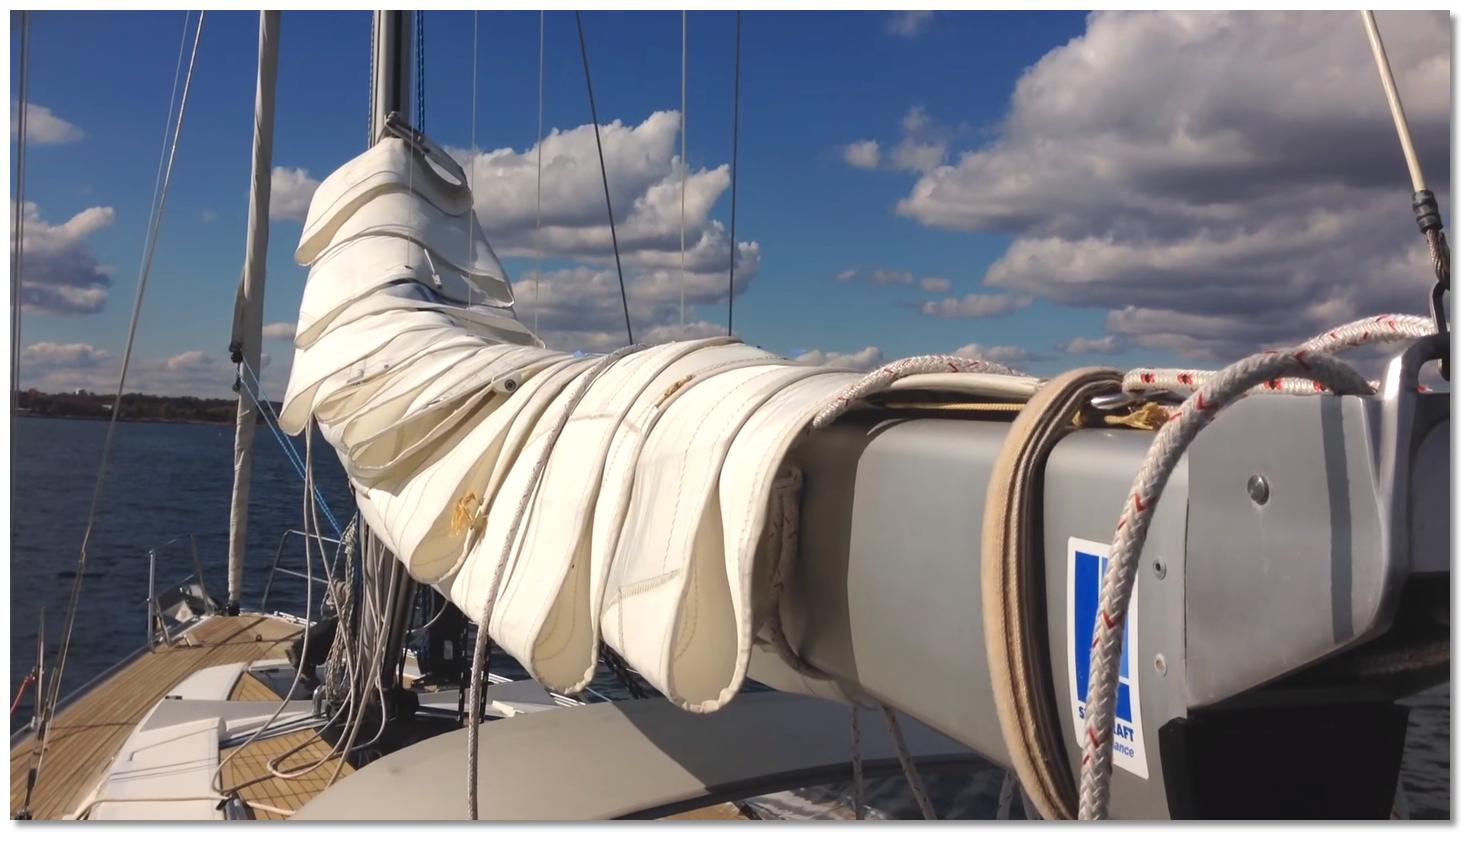 eOceanic - Mainsail furling made easy